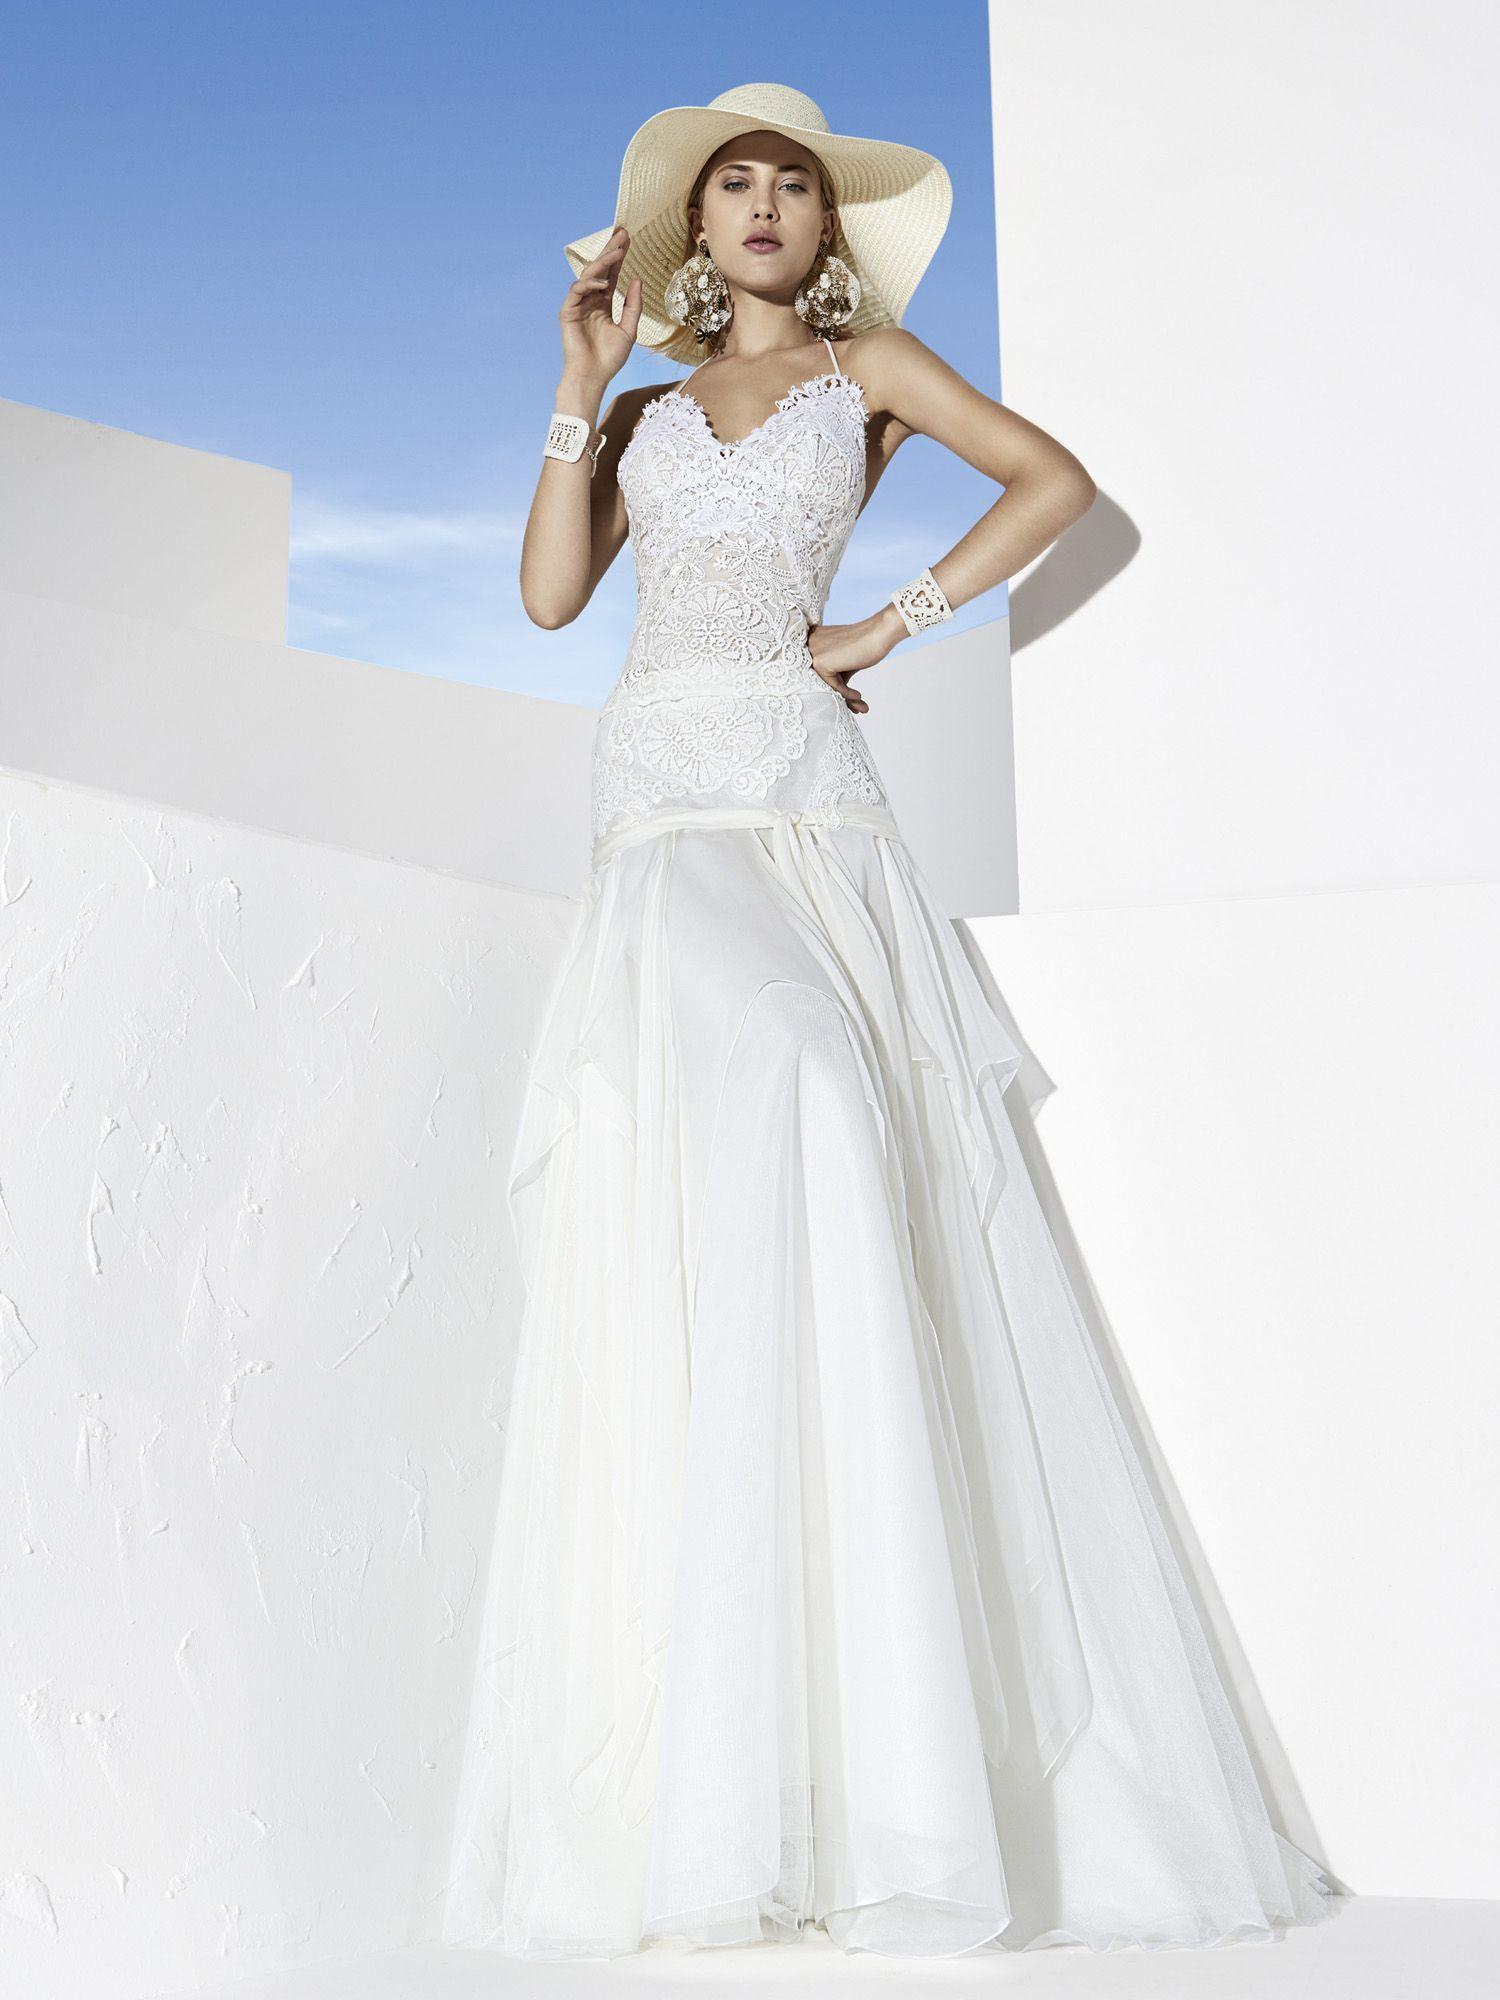 Eibar wedding dress by YolanCris | Boho chic wedding dresses